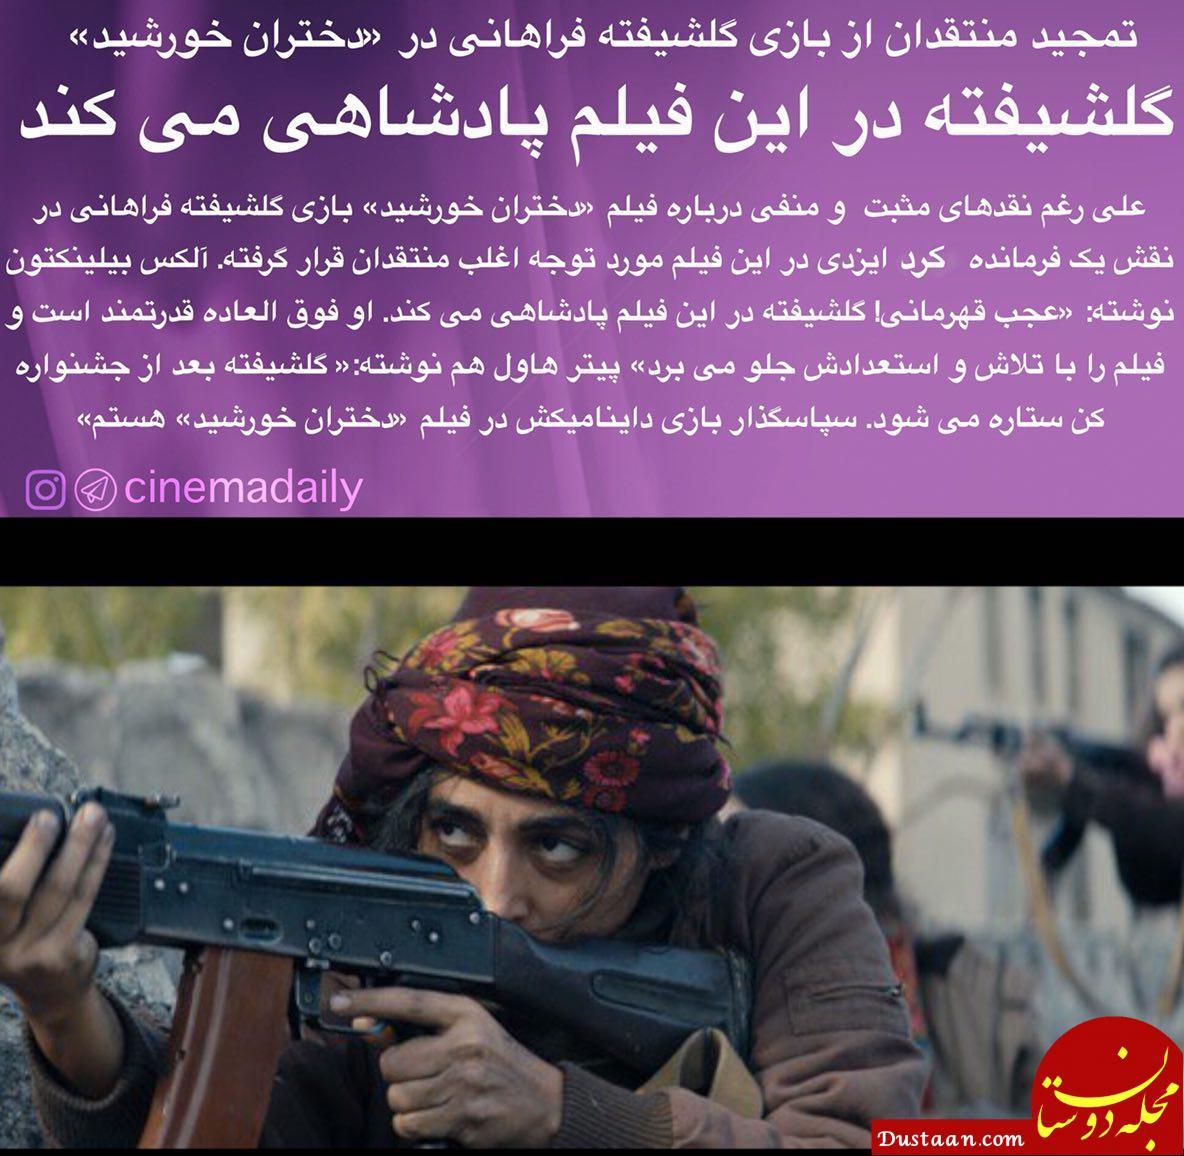 www.dustaan.com گلشیفته فراهانی در این فیلم پادشاهی می کند! +عکس